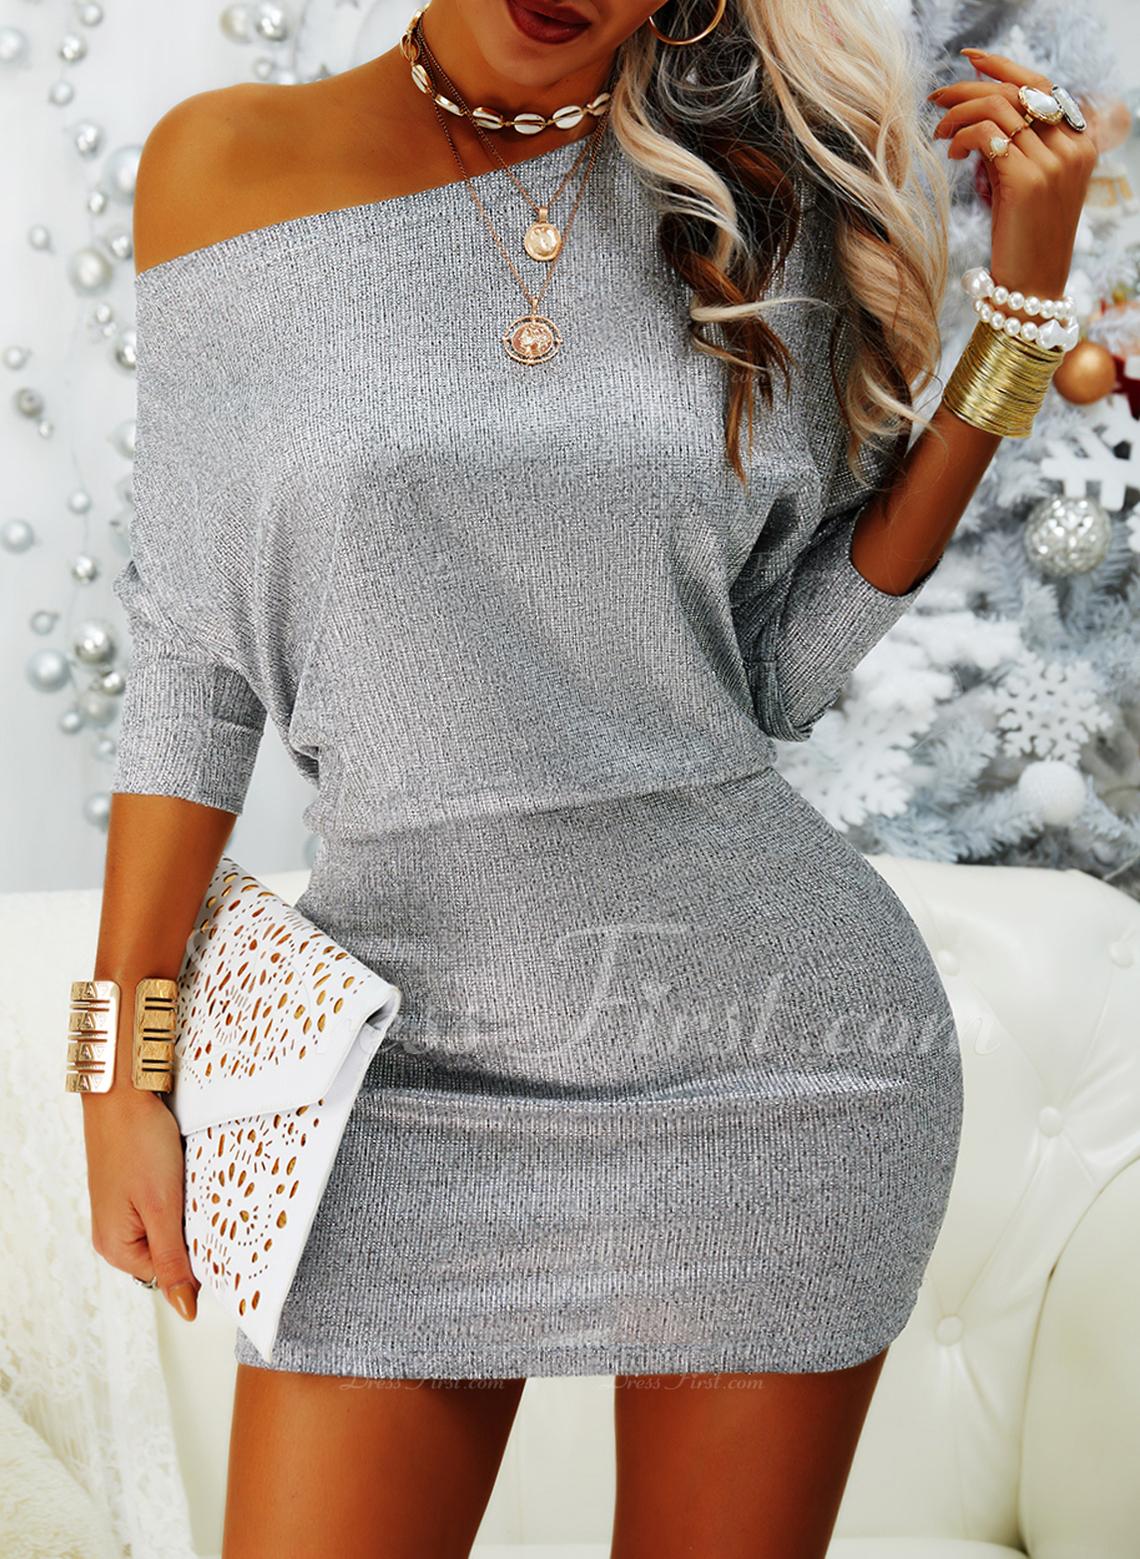 Sequins Bodycon Long Sleeves Mini Party Elegant Dresses